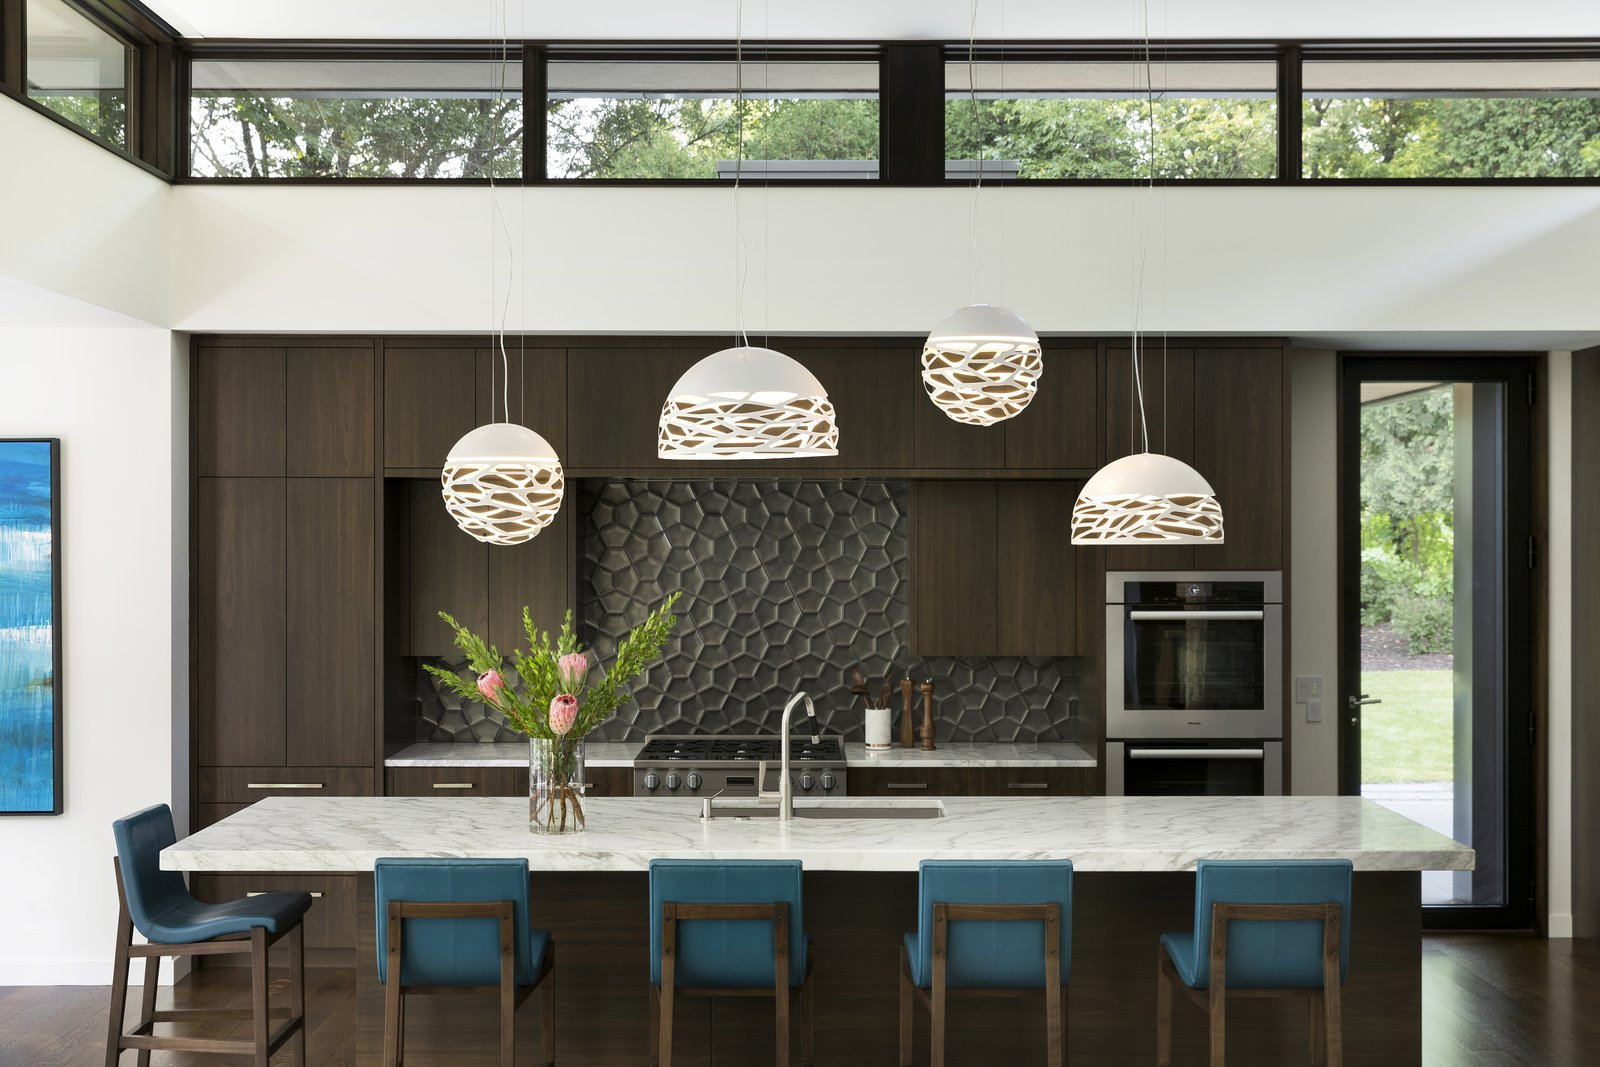 Kitchen, Wall Oven, Cooktops, Engineered Quartz, Medium Hardwood, Ceramic Tile, Mosaic Tile, Pendant, and Undermount  Kitchen Cooktops Undermount Wall Oven Mosaic Tile Photos from Sunfish Lake Residence